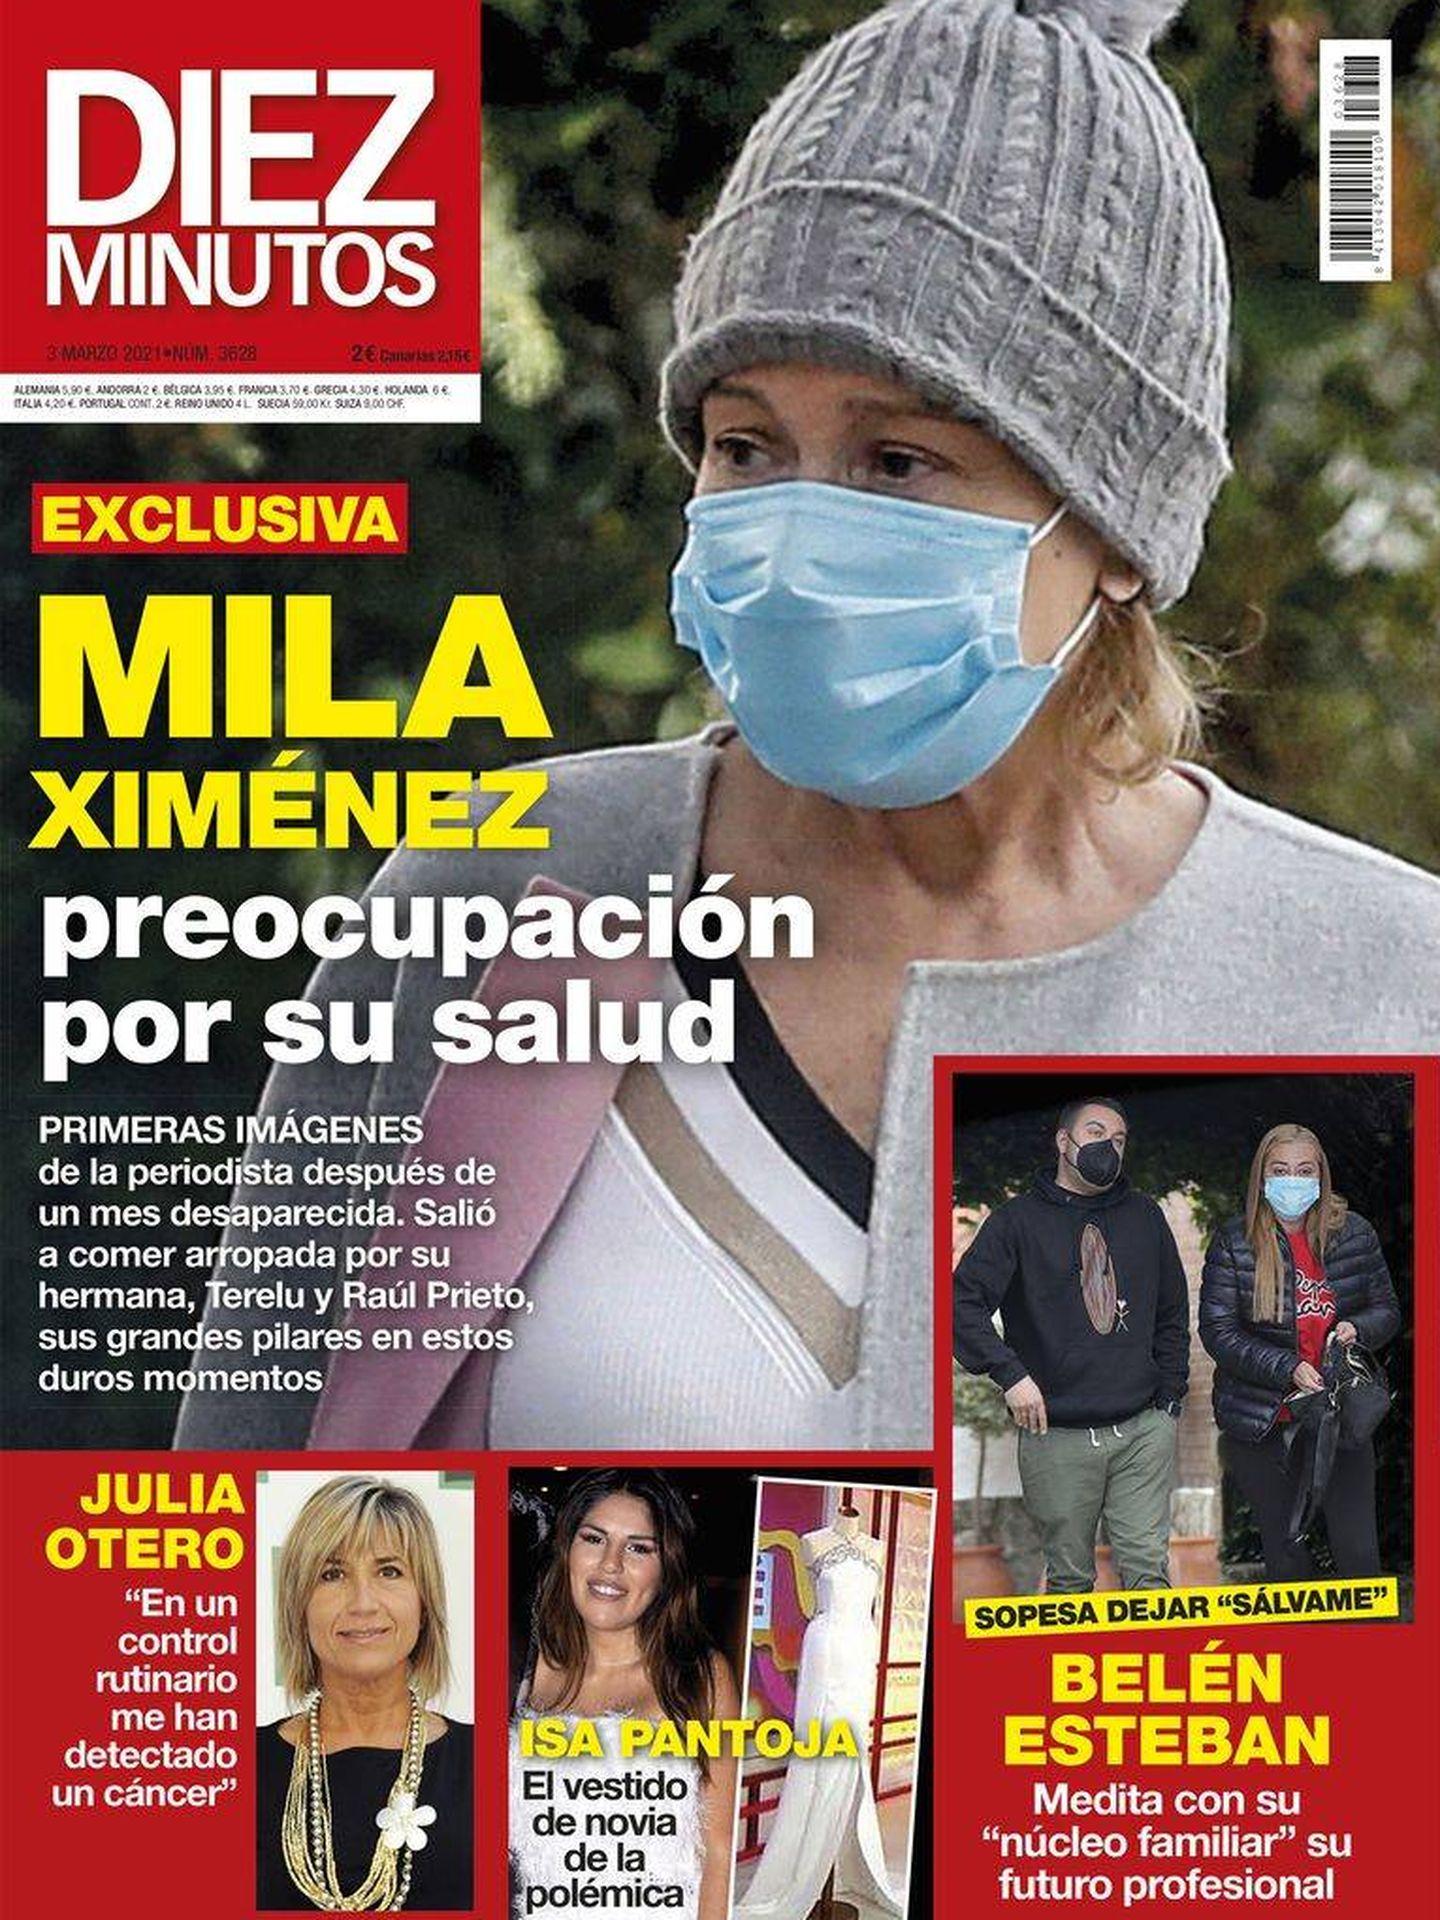 Mila Ximénez en la portada de Diez Minutos.